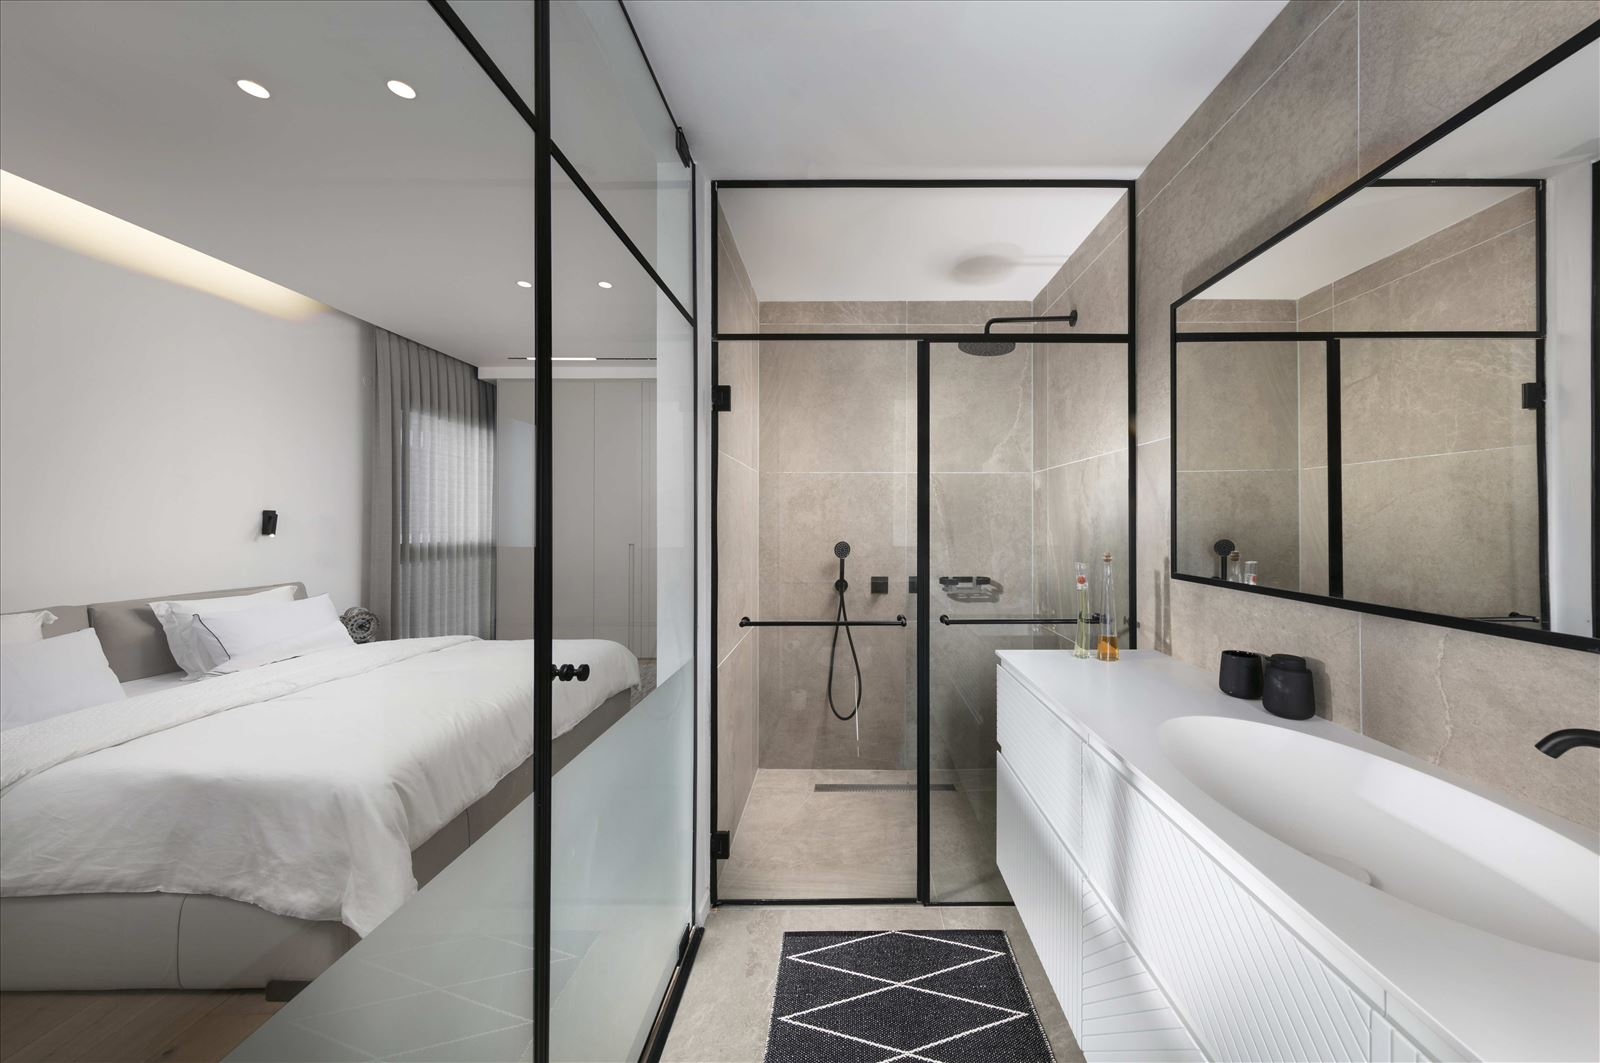 Private home - Herzliya תאורה במקלחון של החדר על ידי קמחי תאורה